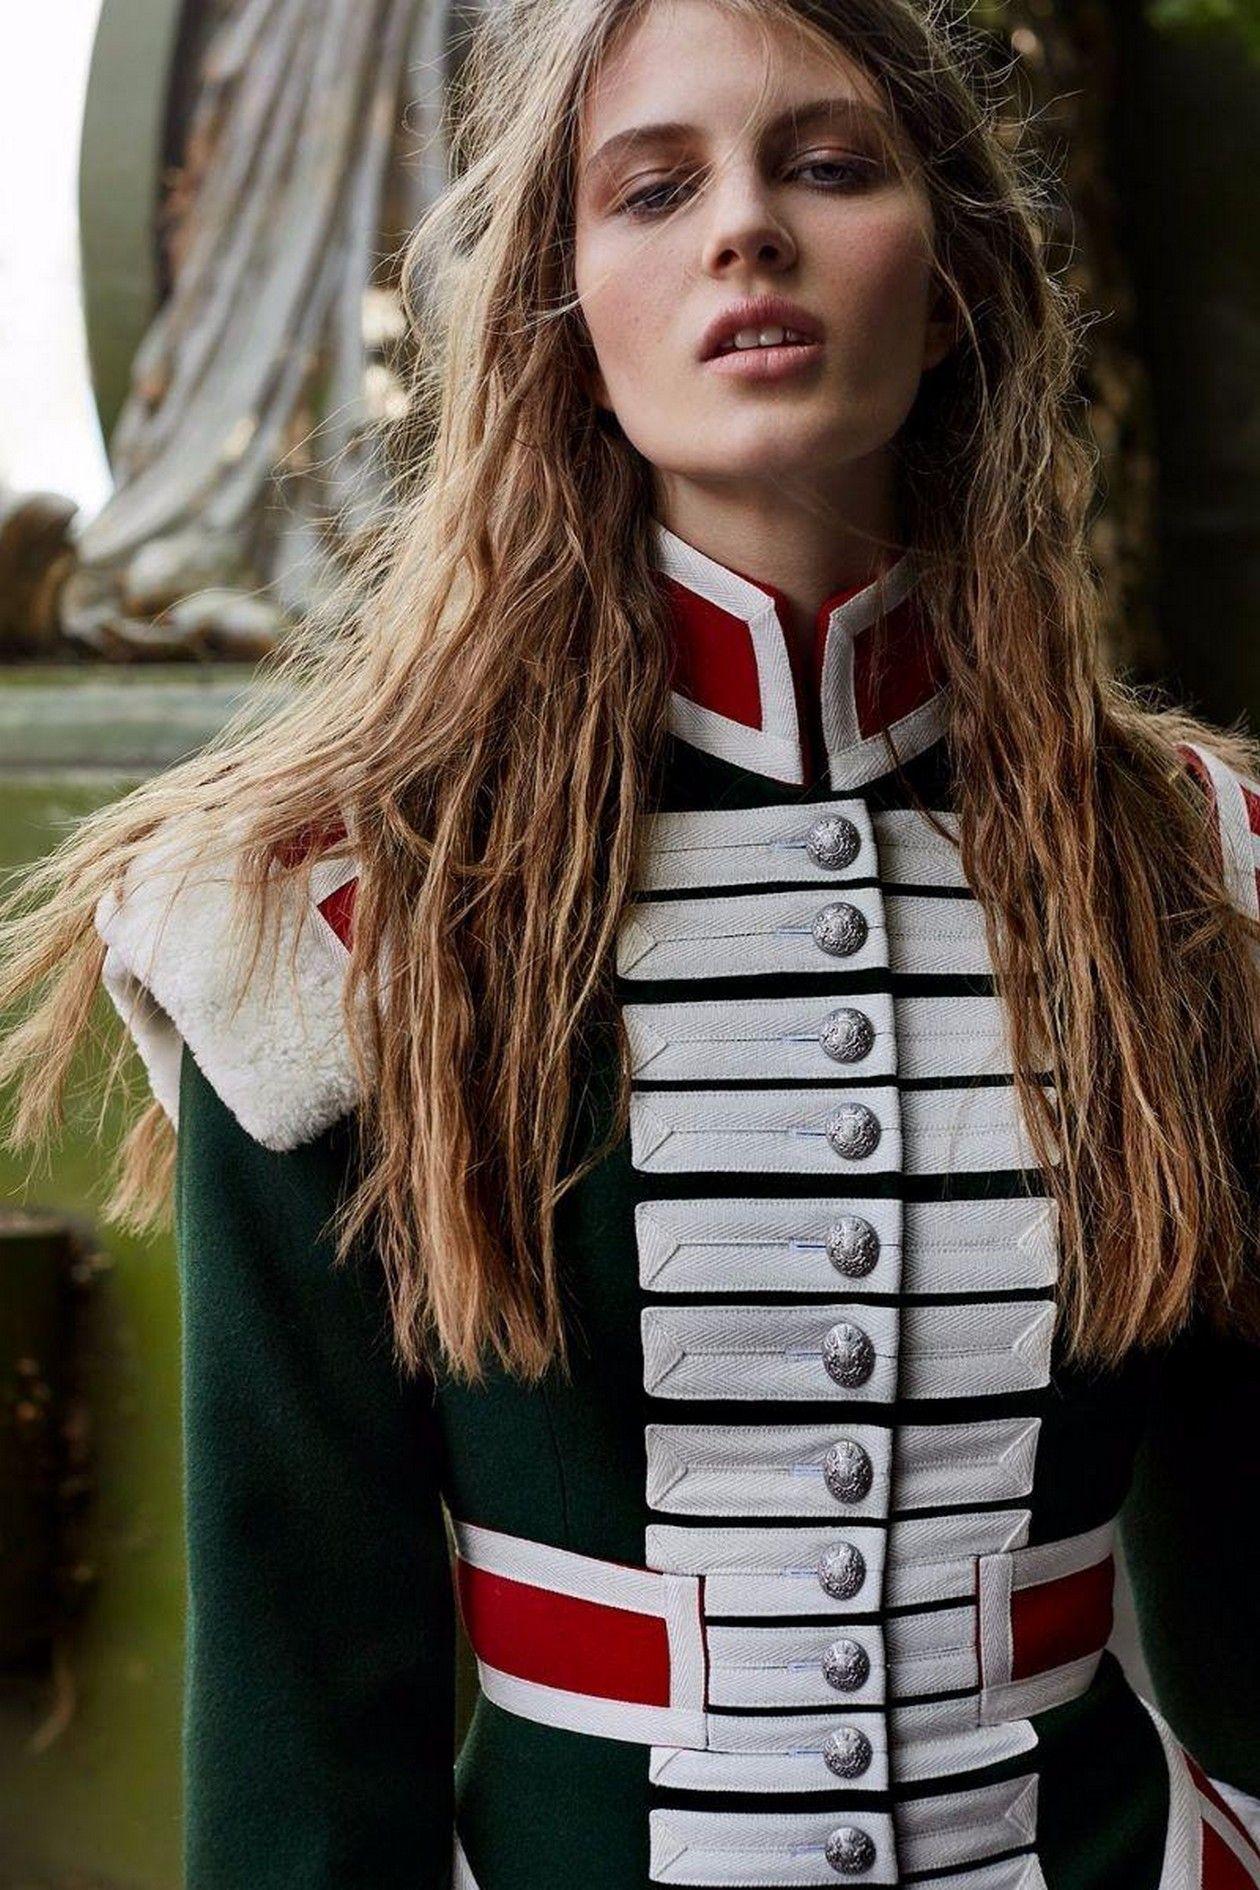 Florence Kosky - Model / Harper's Bazaar UK Girls About Town / published: November 2017 / Agata Pospieszynska - Photographer Charlie Harrington - Fashion Editor/Stylist Mirka Mysicka - Hair Stylist Florrie White - Makeup Artist